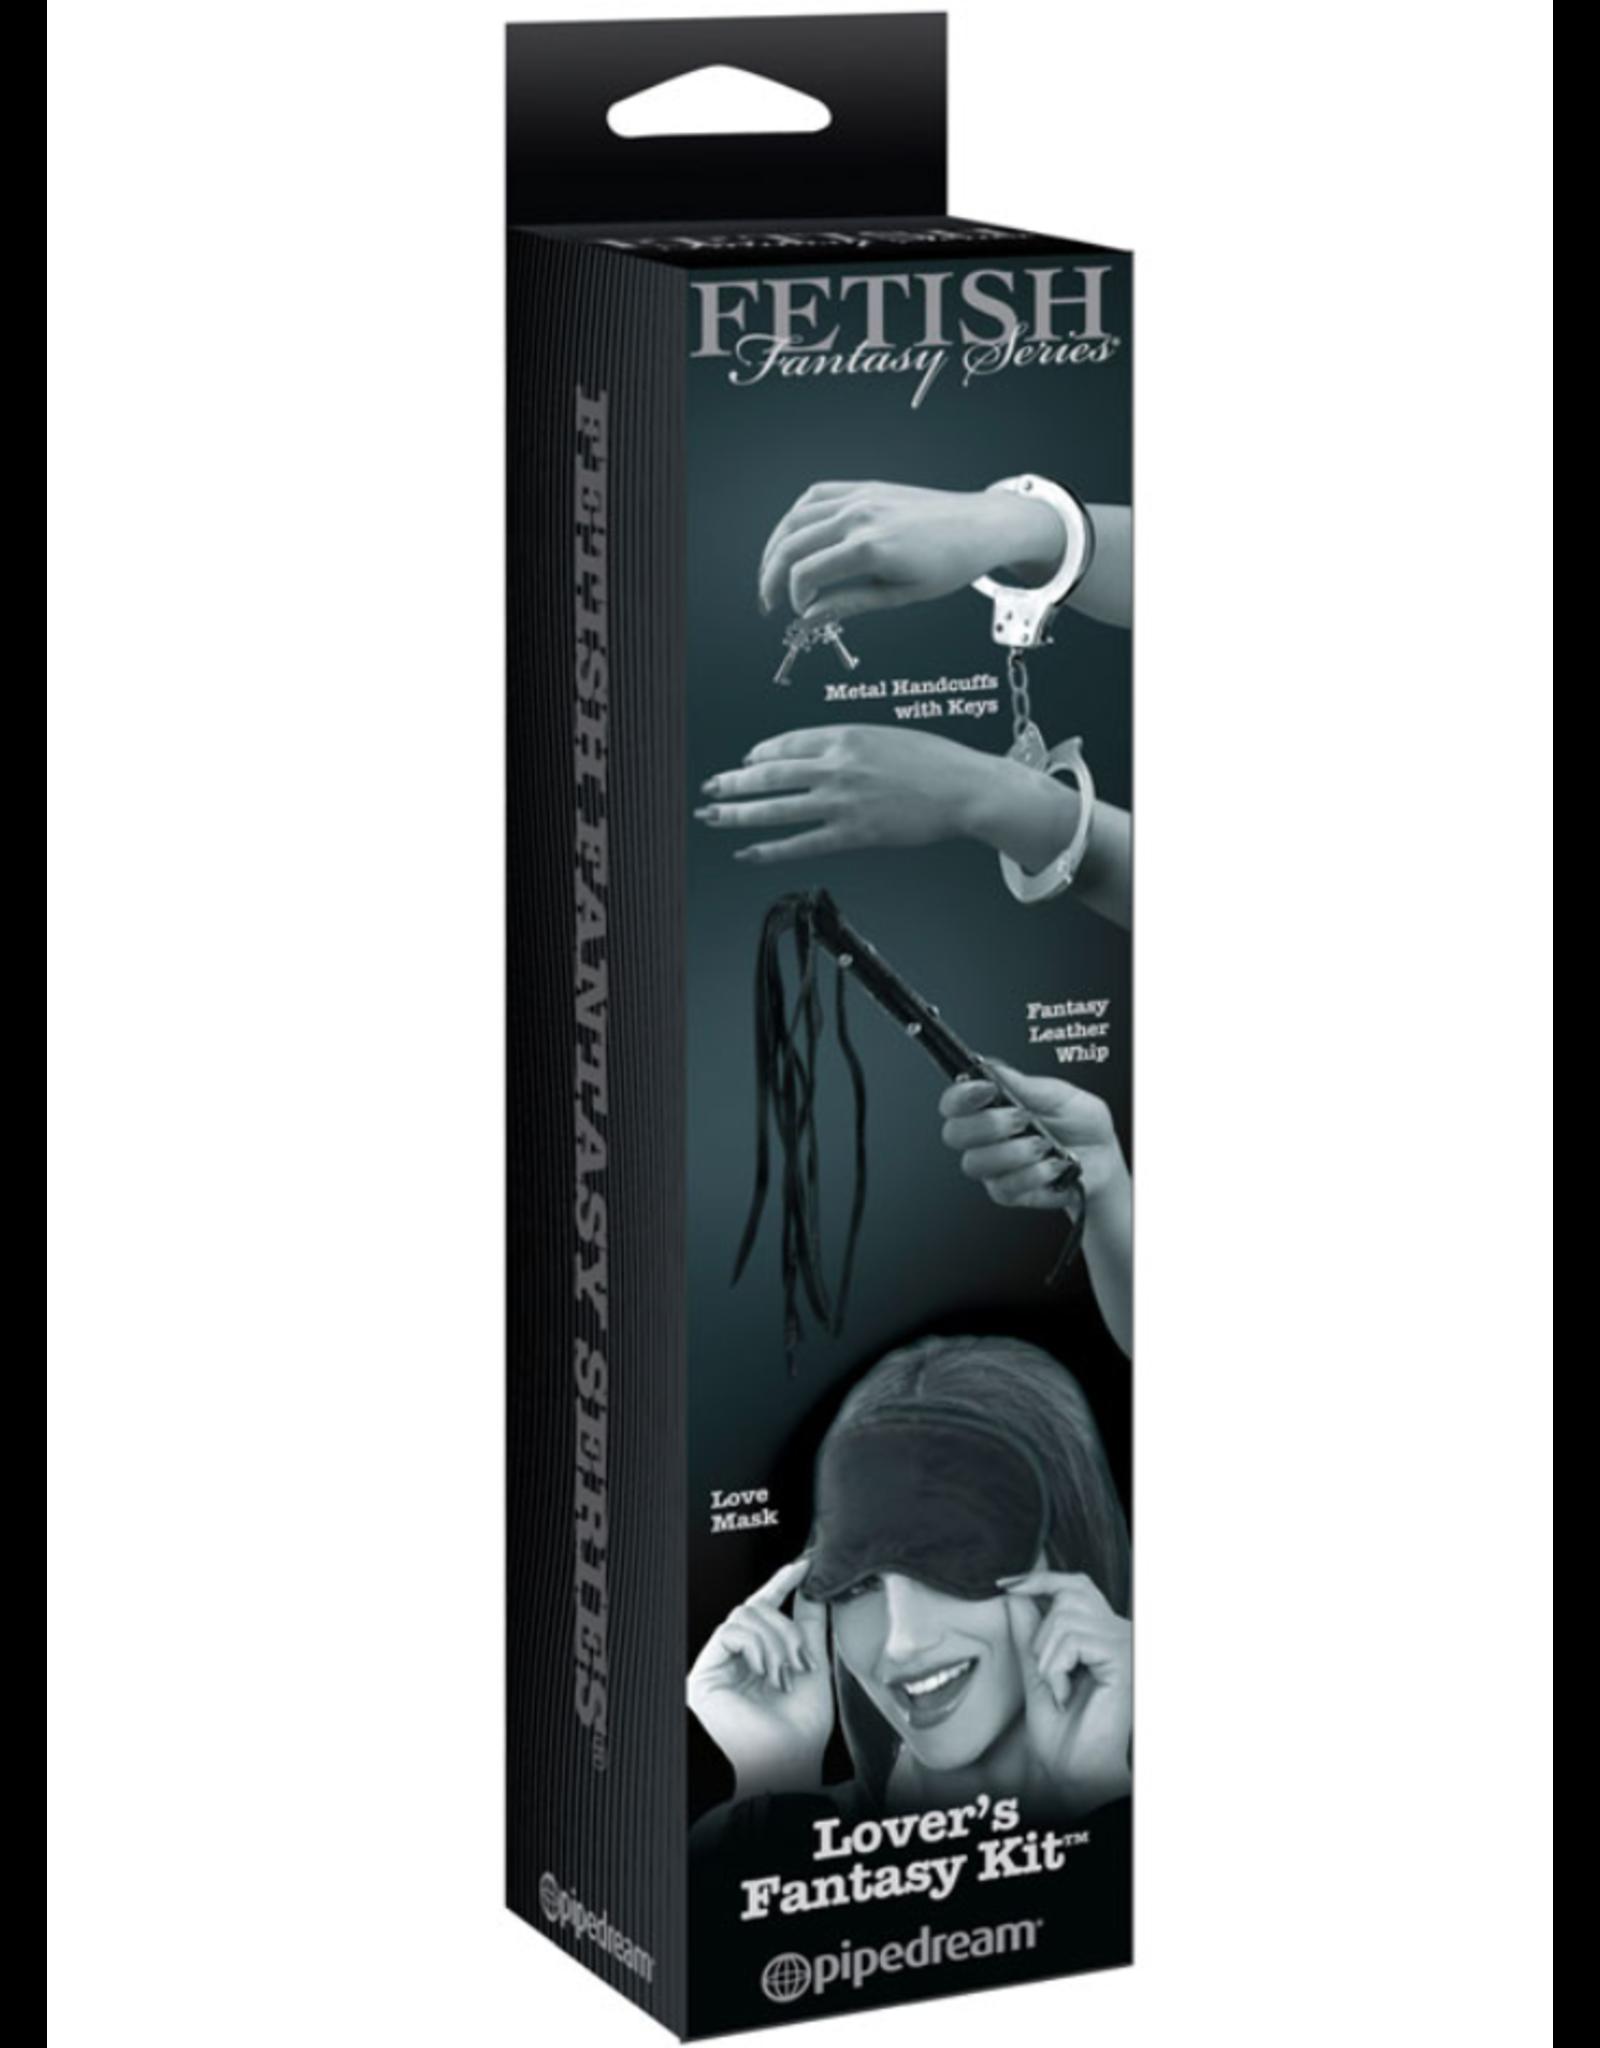 Fetish Fantasy Limited Edition Lovers Fantasy Kit